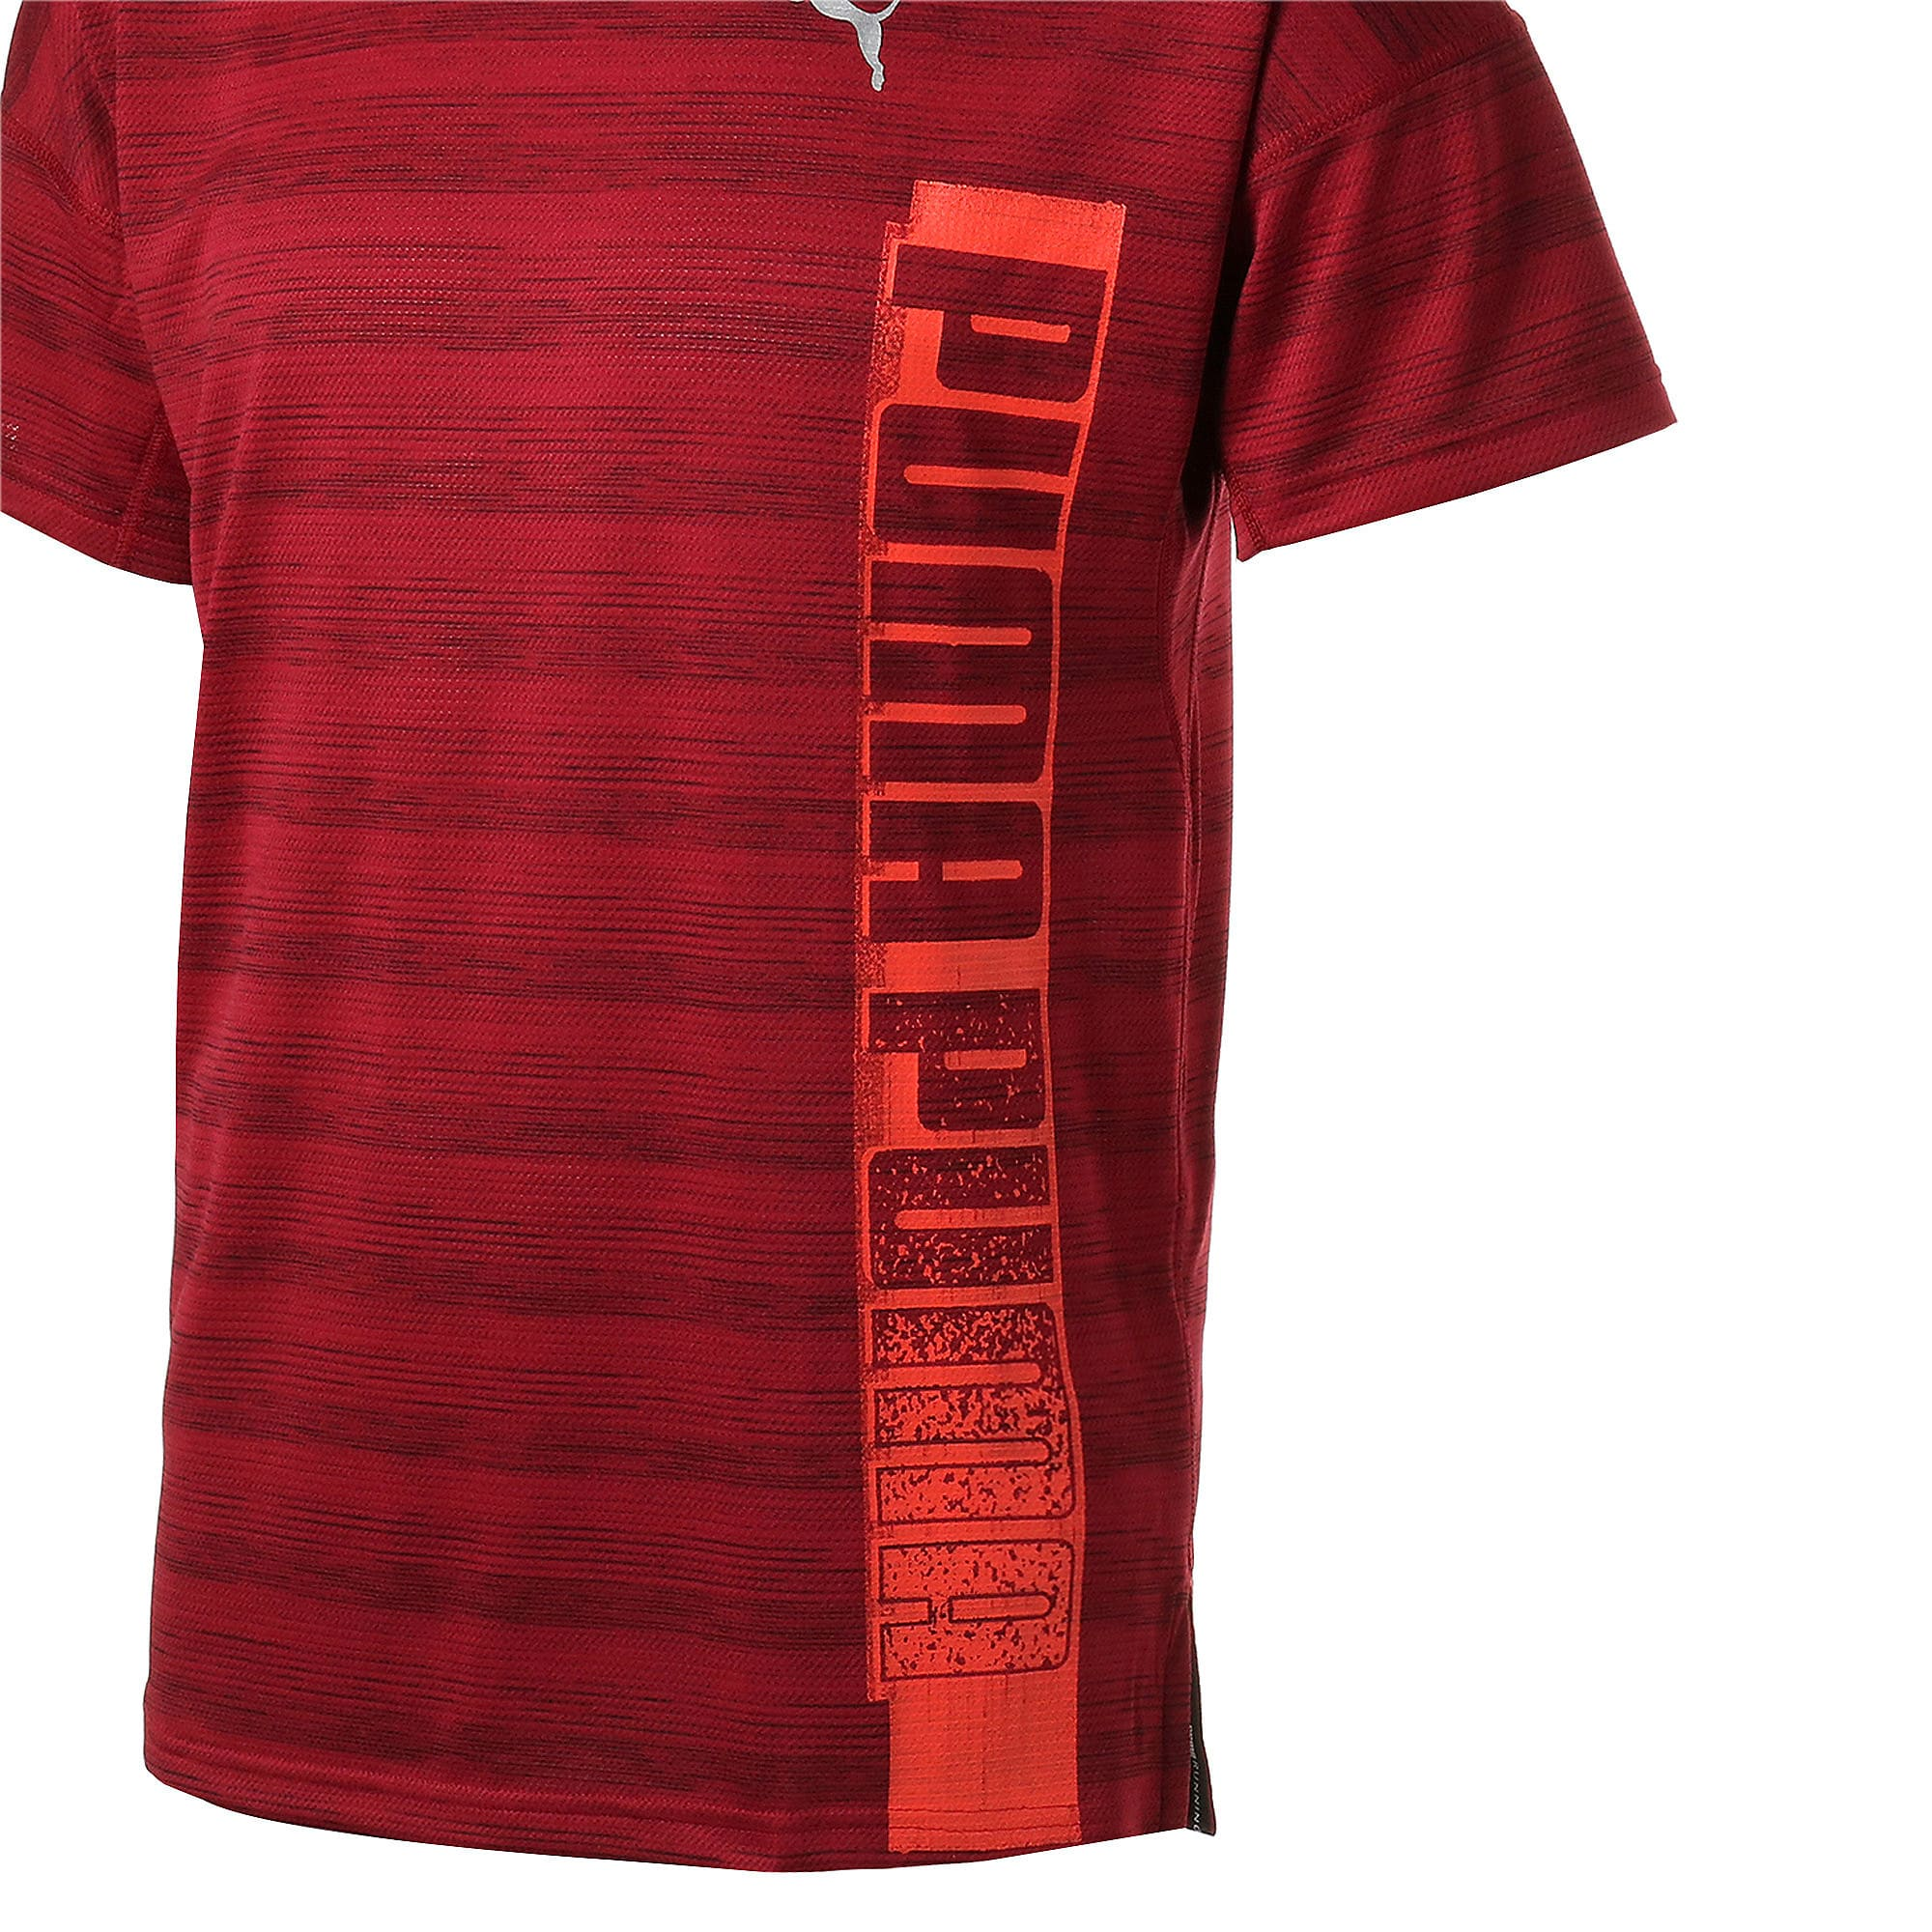 Thumbnail 10 of LAST LAP ヘザー SS ランニング Tシャツ 半袖, Rhubarb Heather, medium-JPN